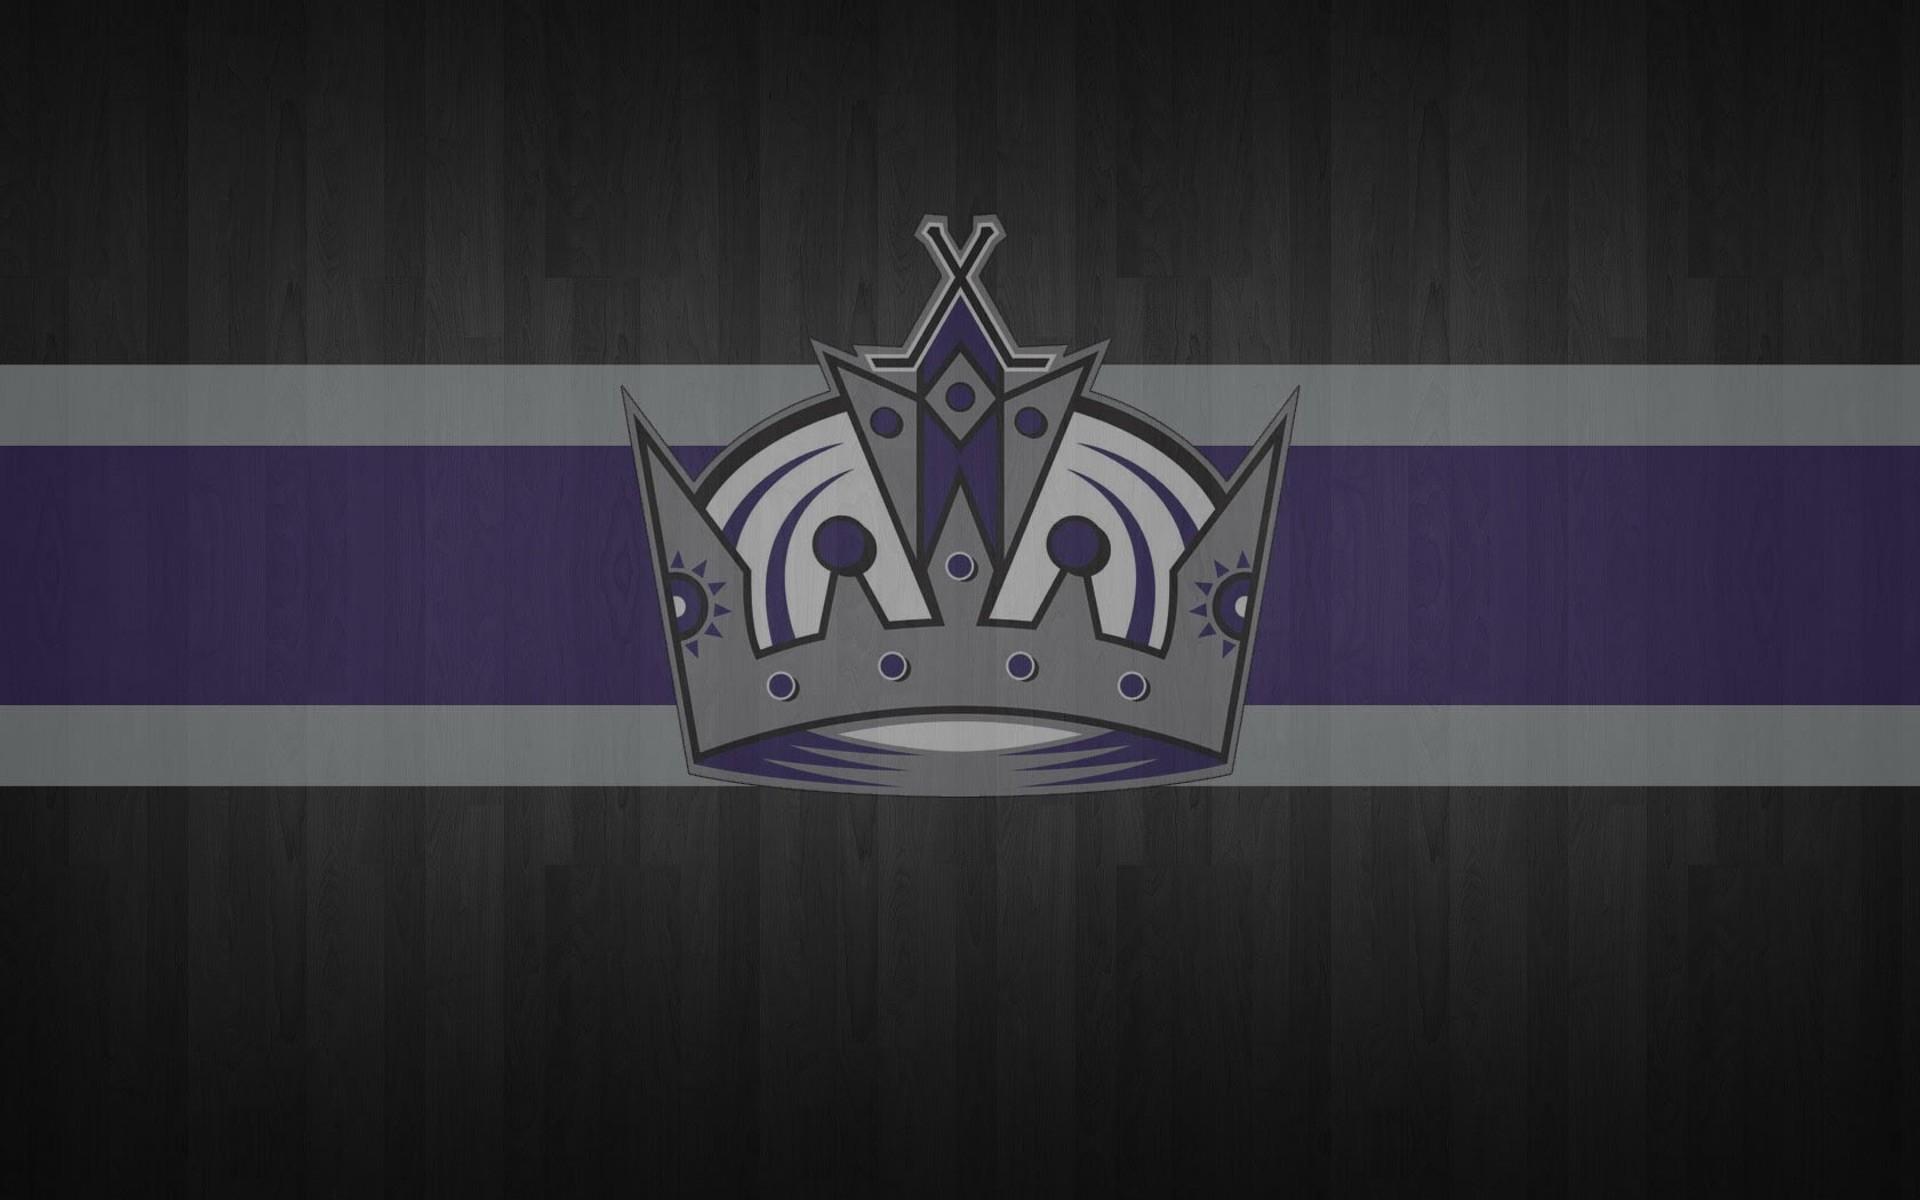 La kings desktop wallpaper 72 images - King wallpaper ...